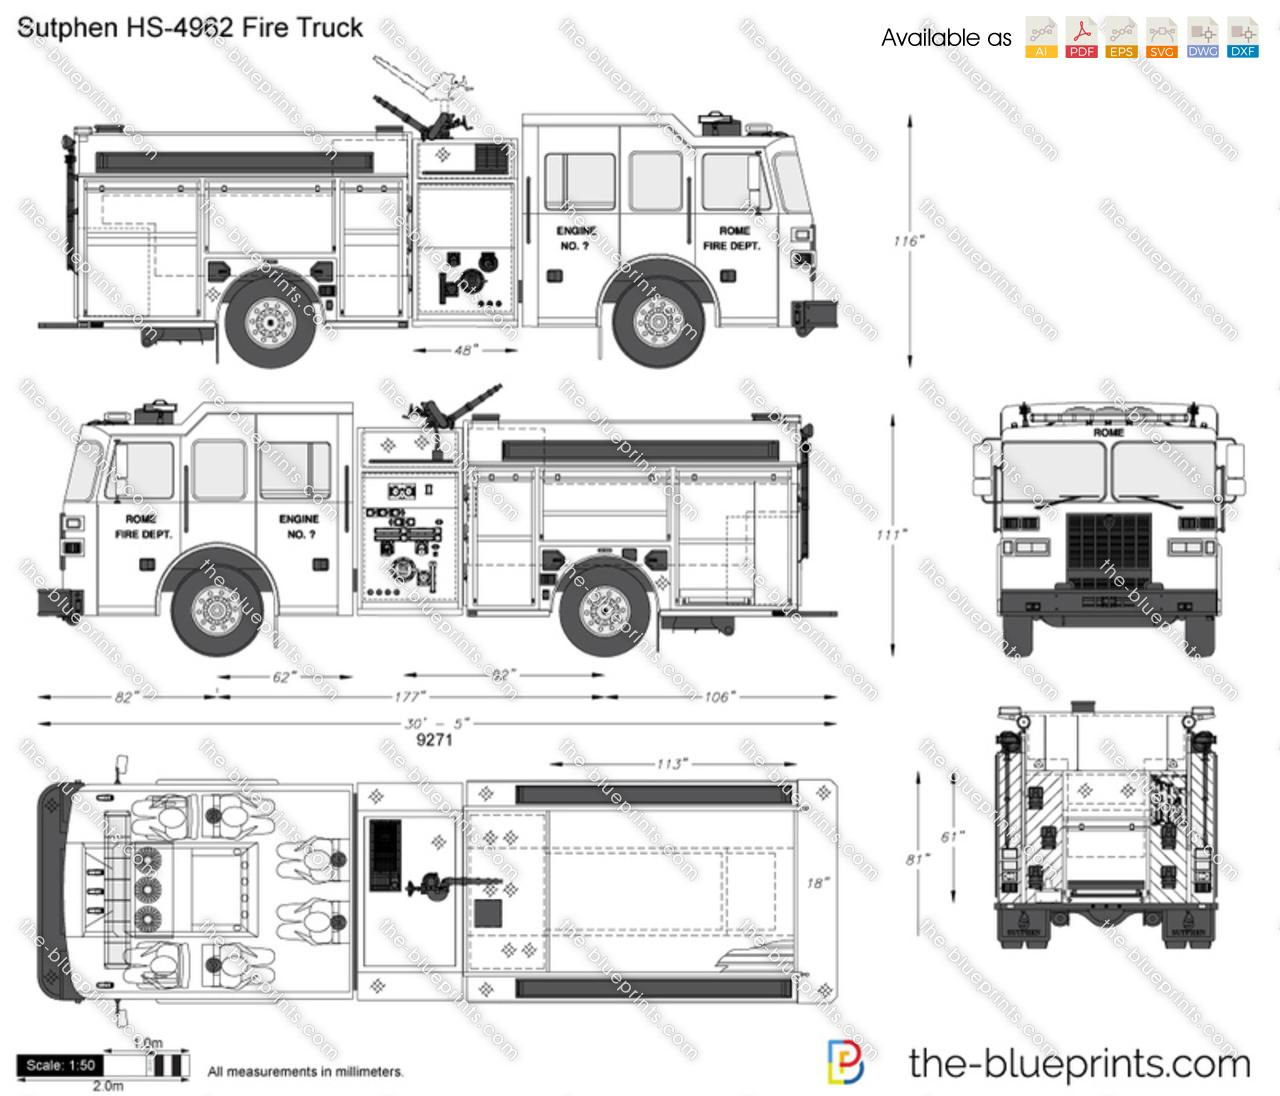 fire truck pumper diagram